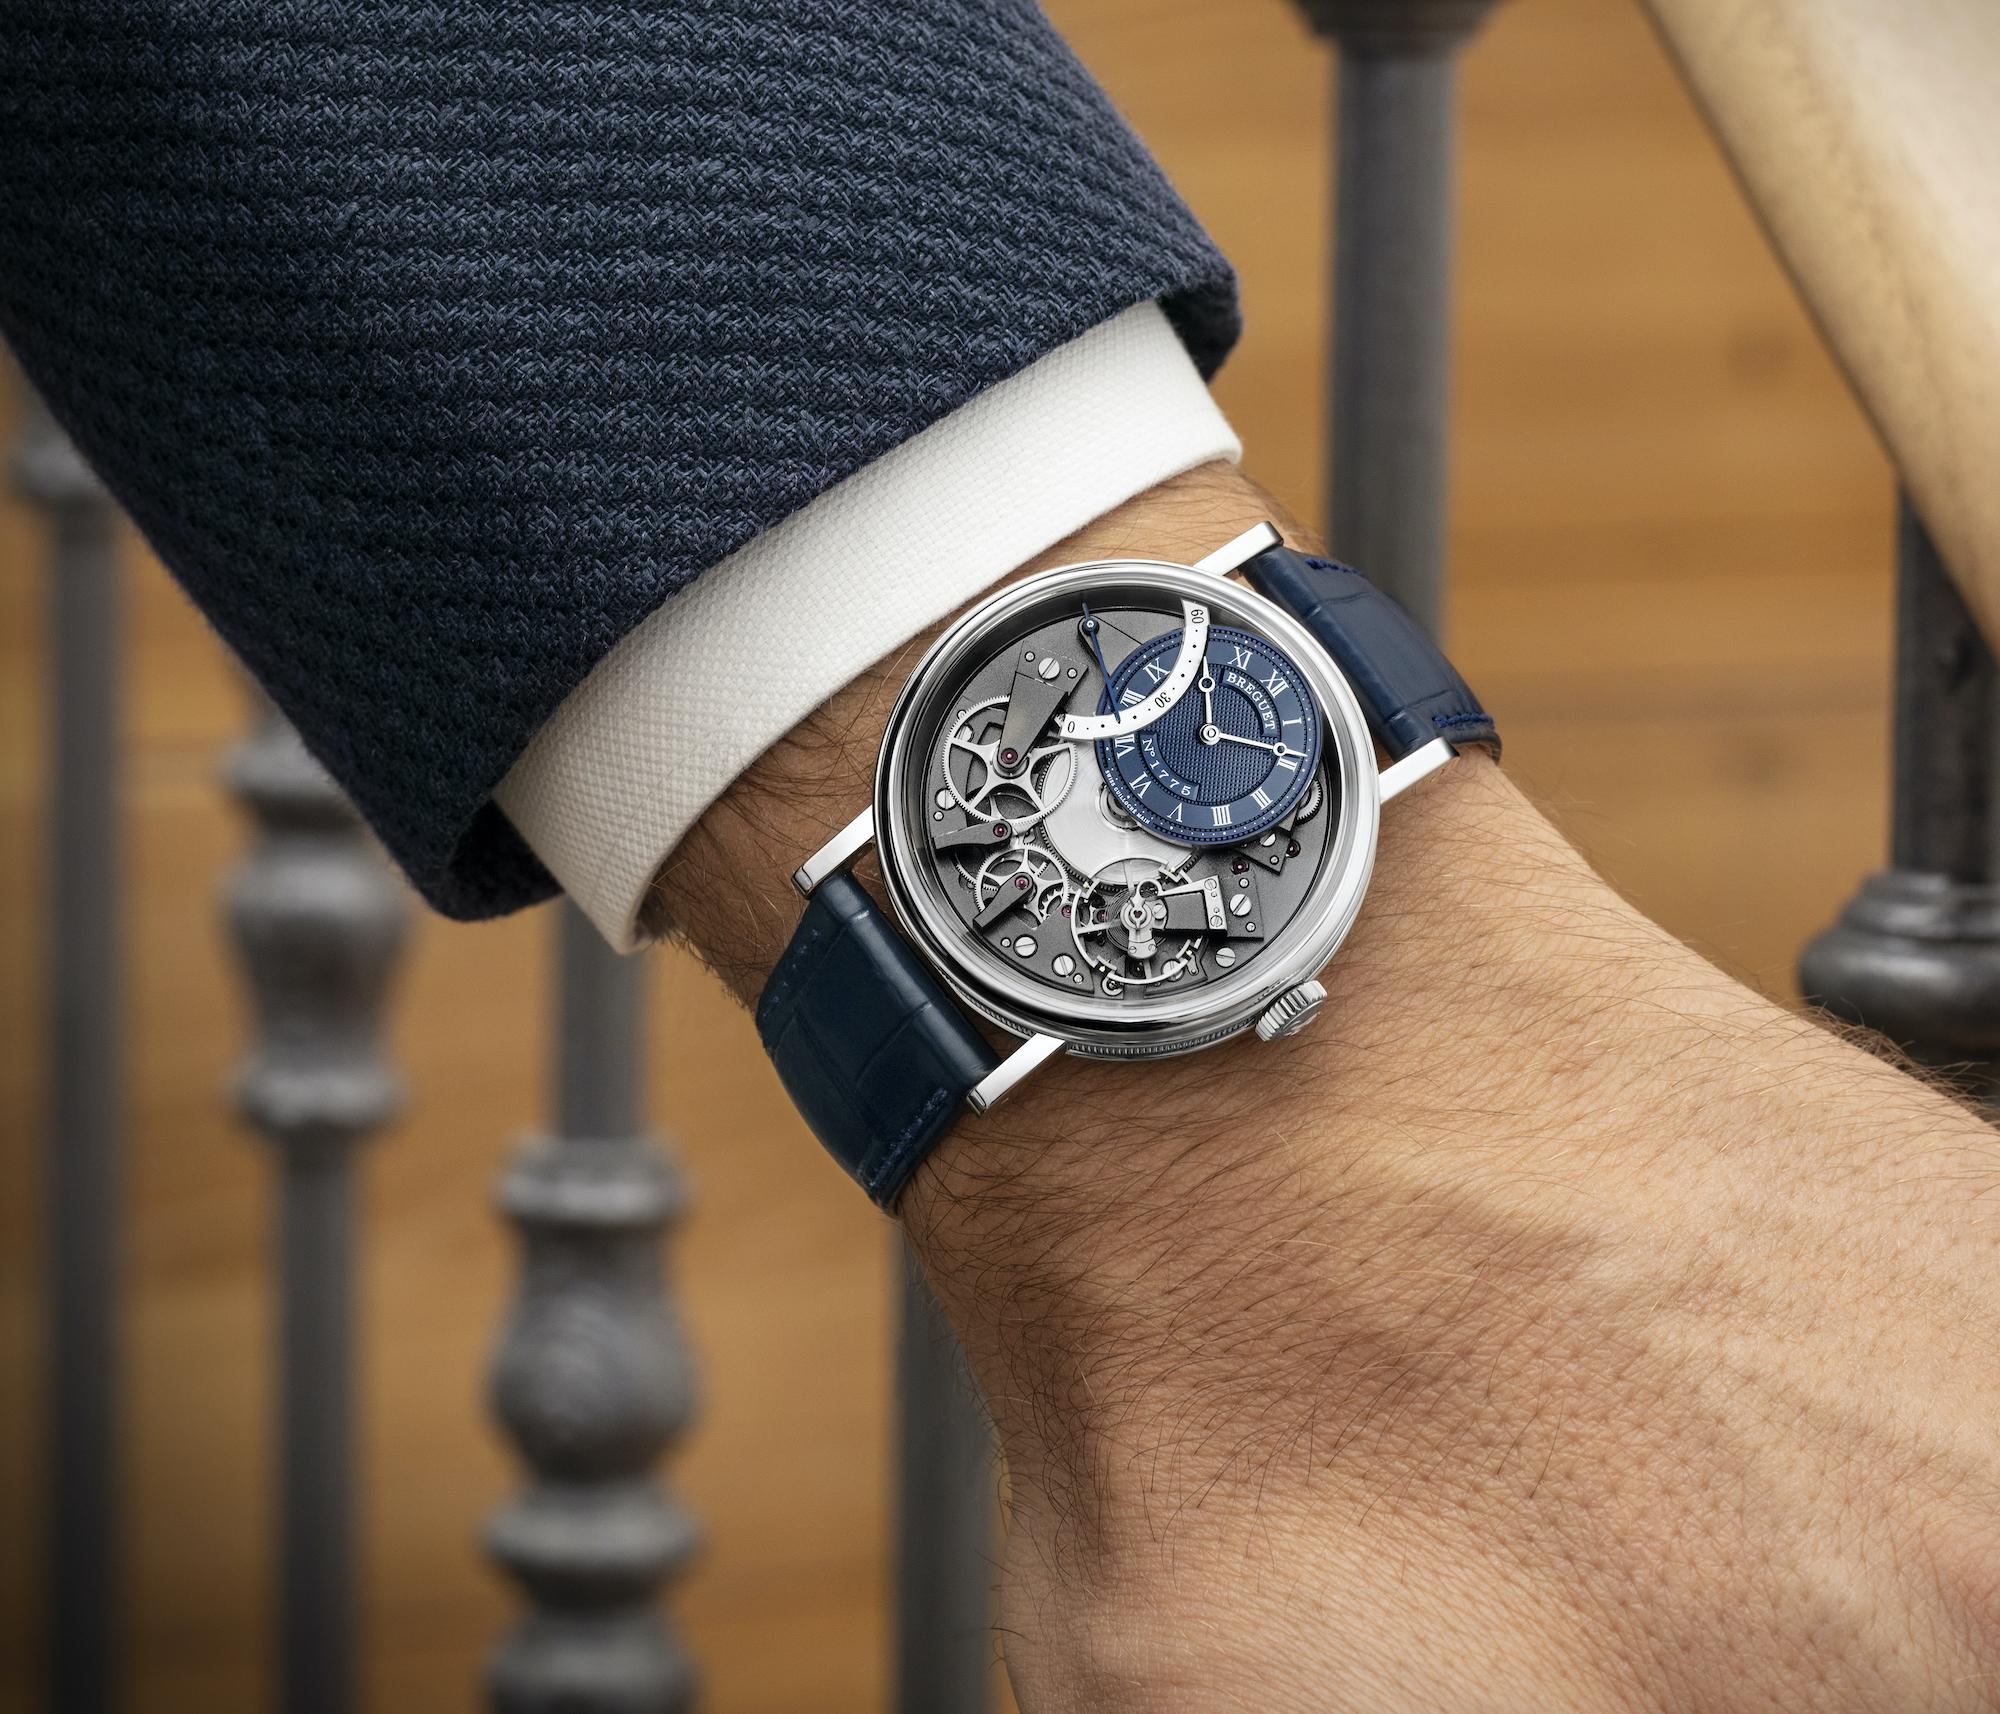 Breguet Tradition Automatique Seconde Retrograde 7097BBGY9WU wristshot